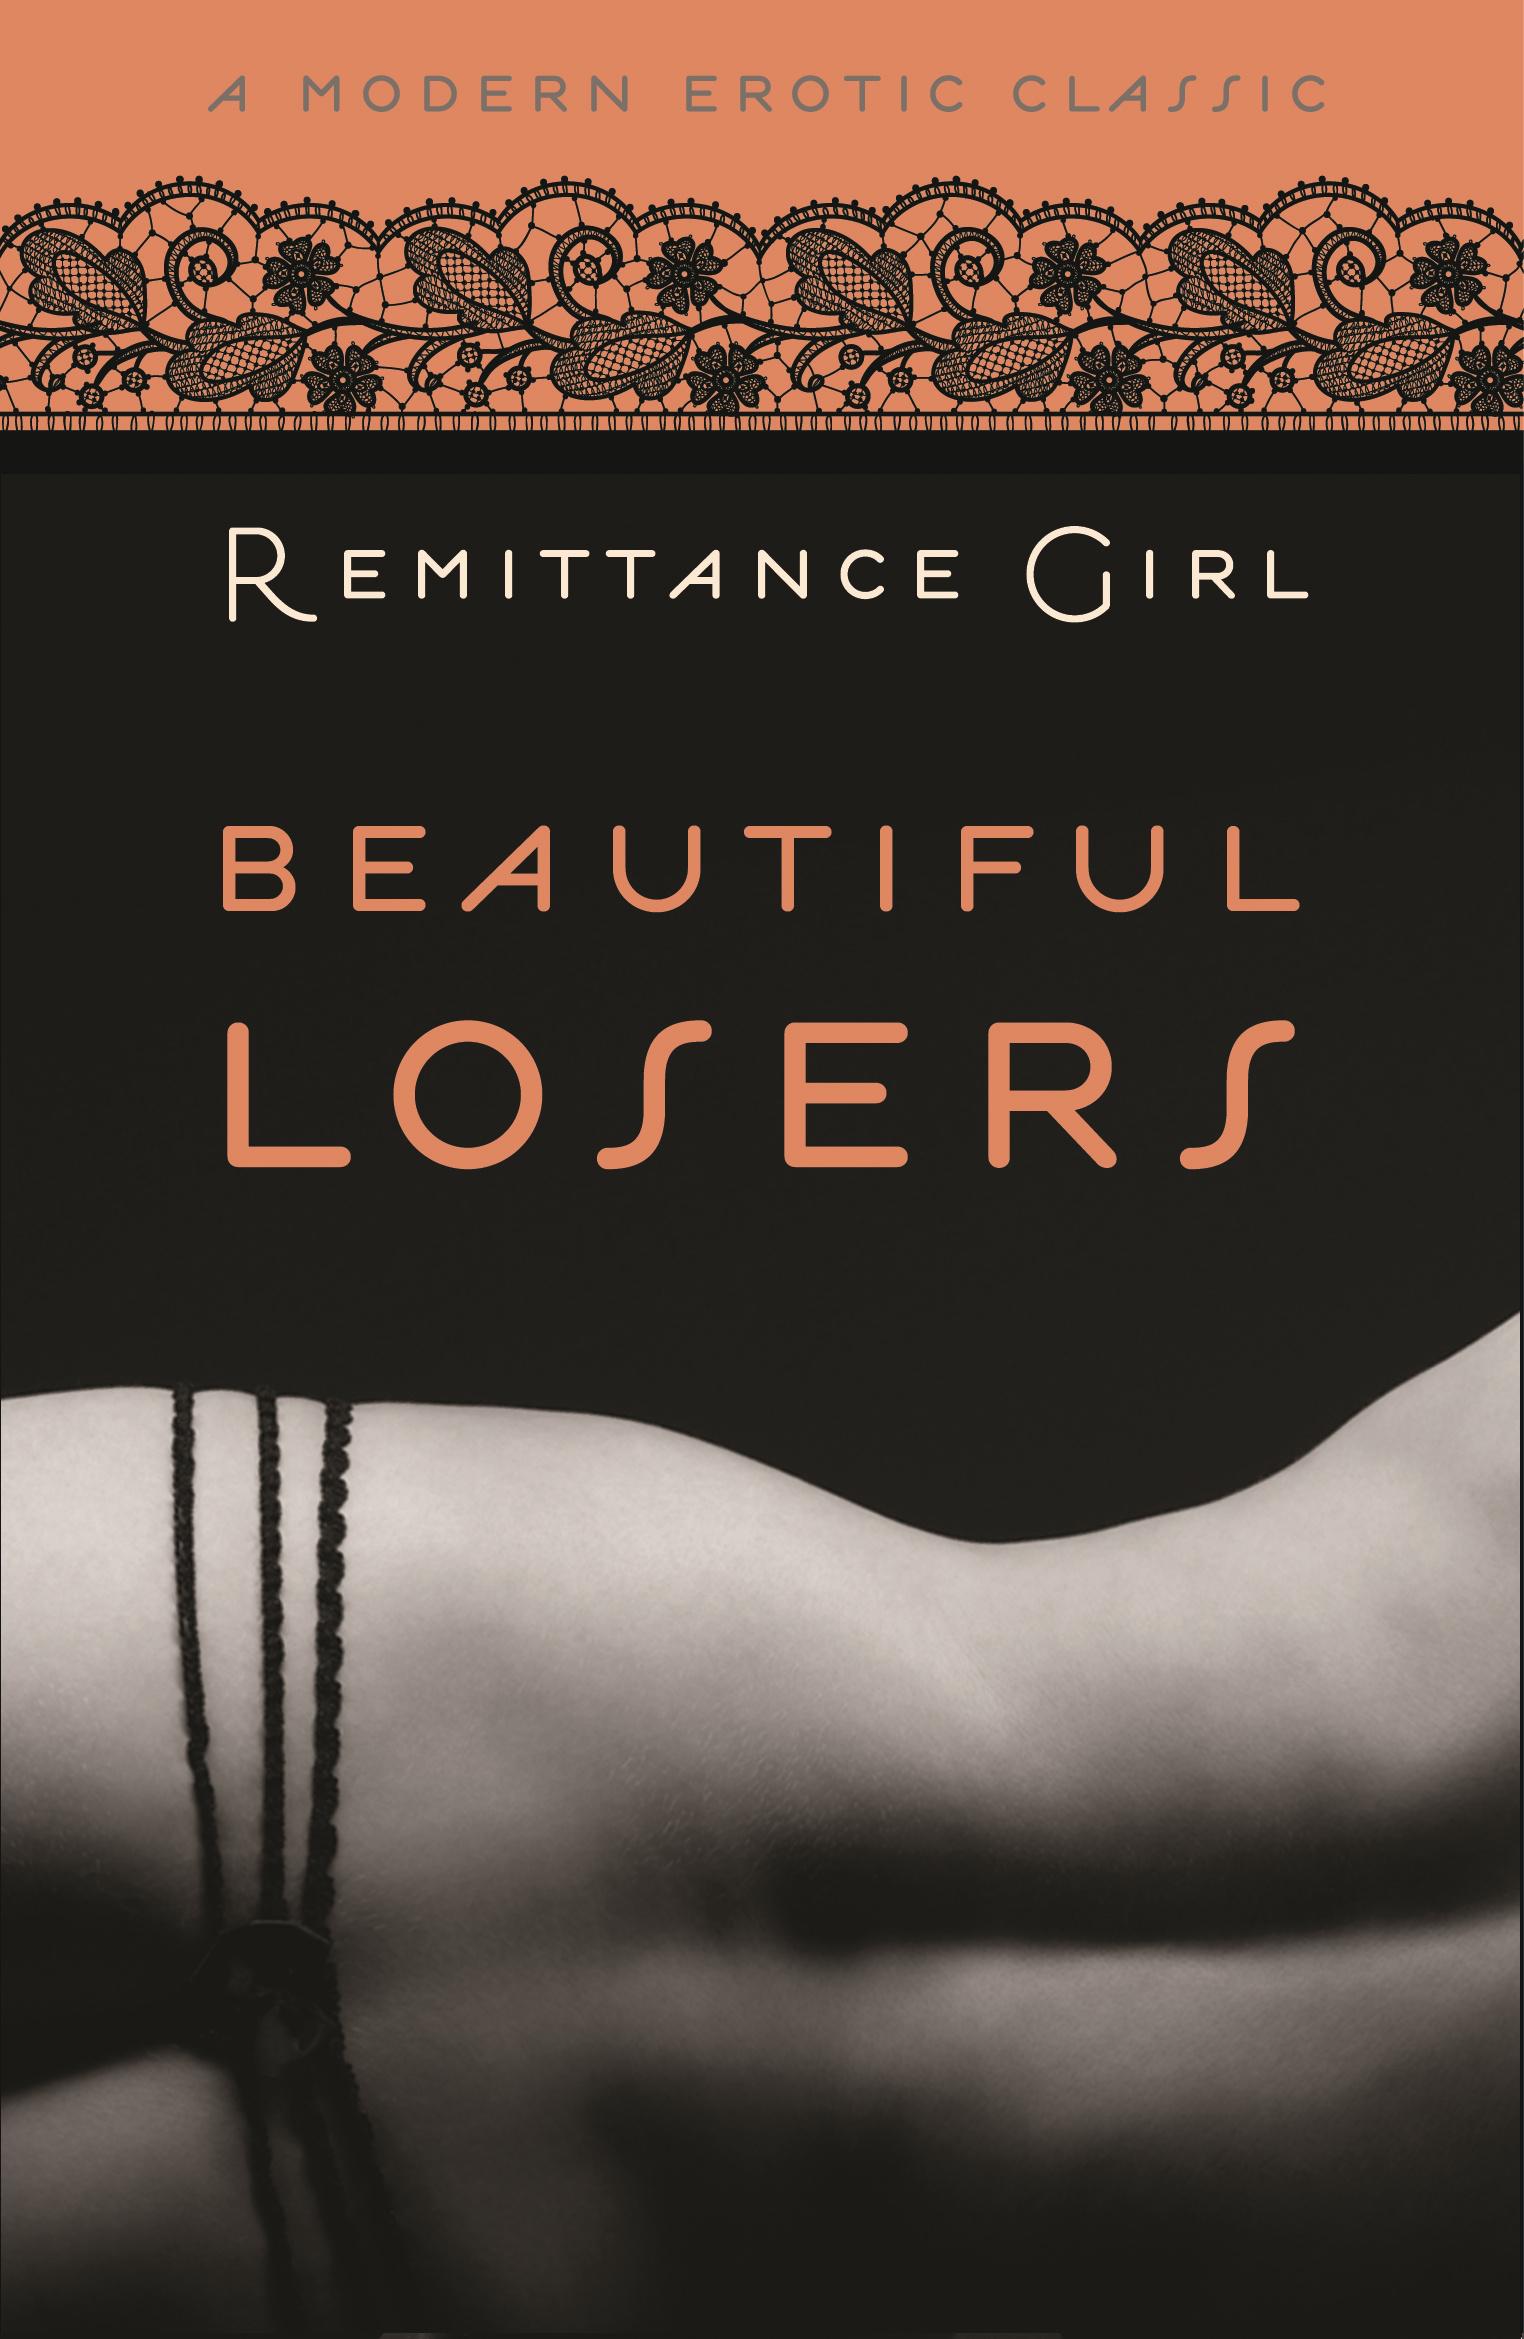 Remittance girl